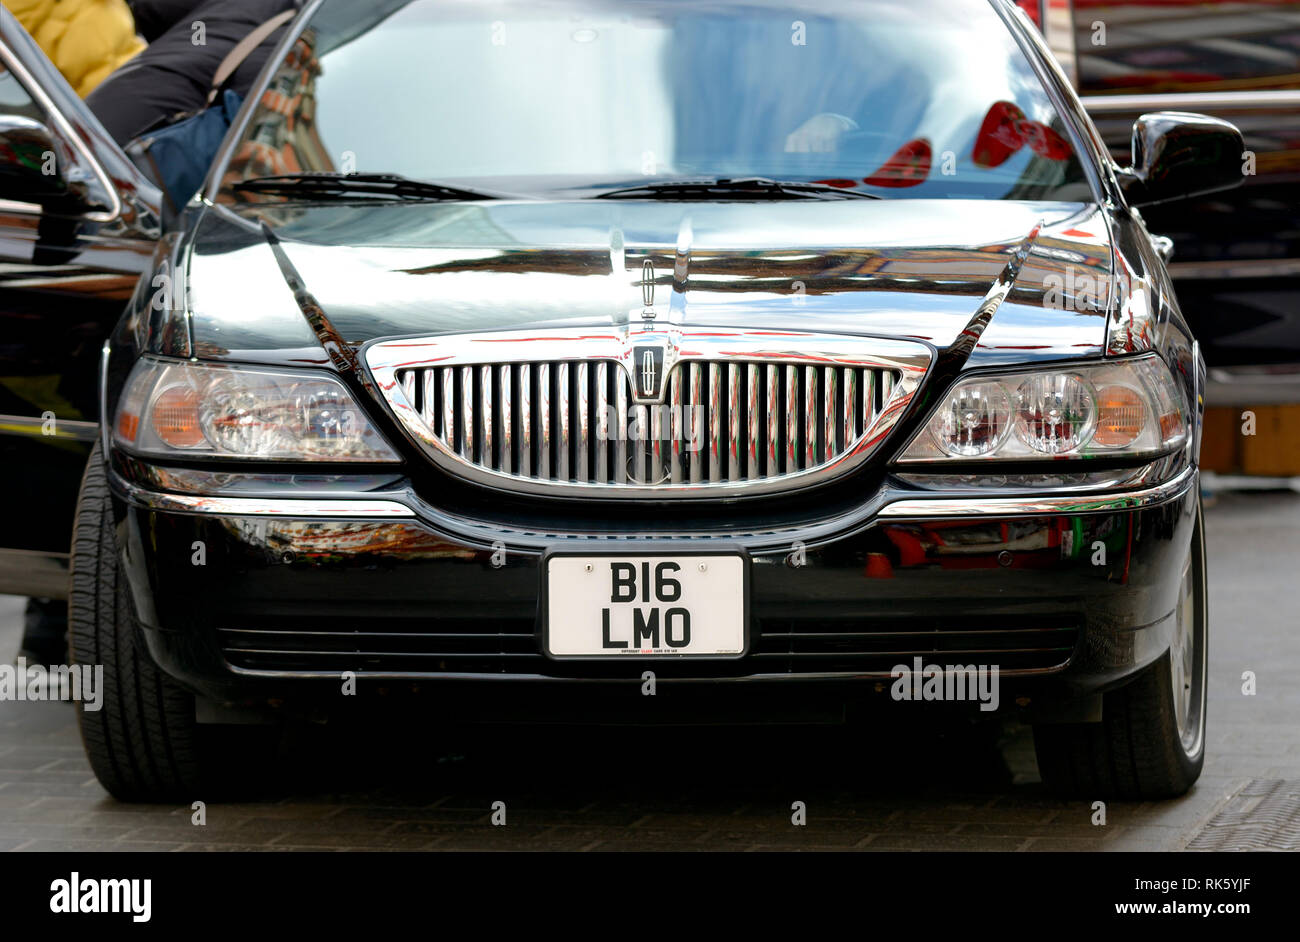 London, England, UK. Lincoln Stretchlimousine mit Nummernschild BI 6 LVO (Big Limo, fast) Stockfoto